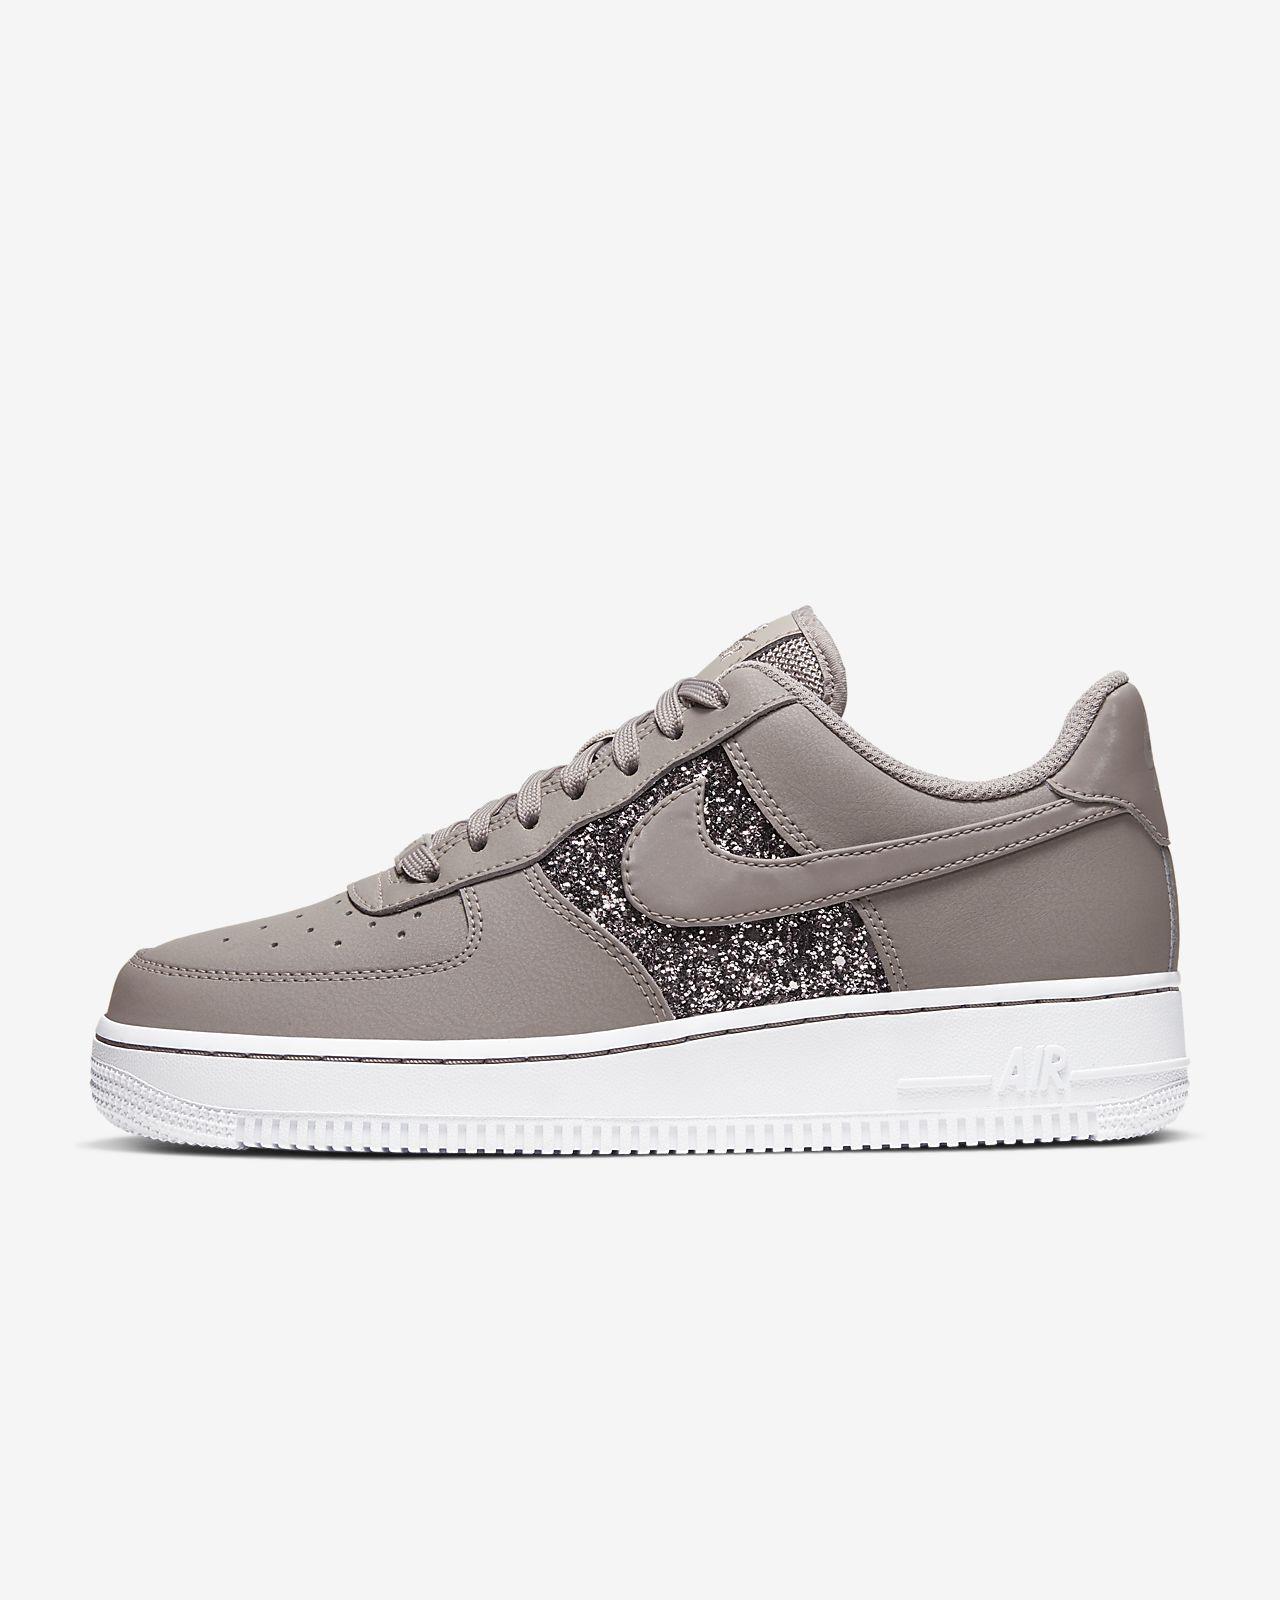 Dámská bota se třpytkami Nike Air Force 1 Low